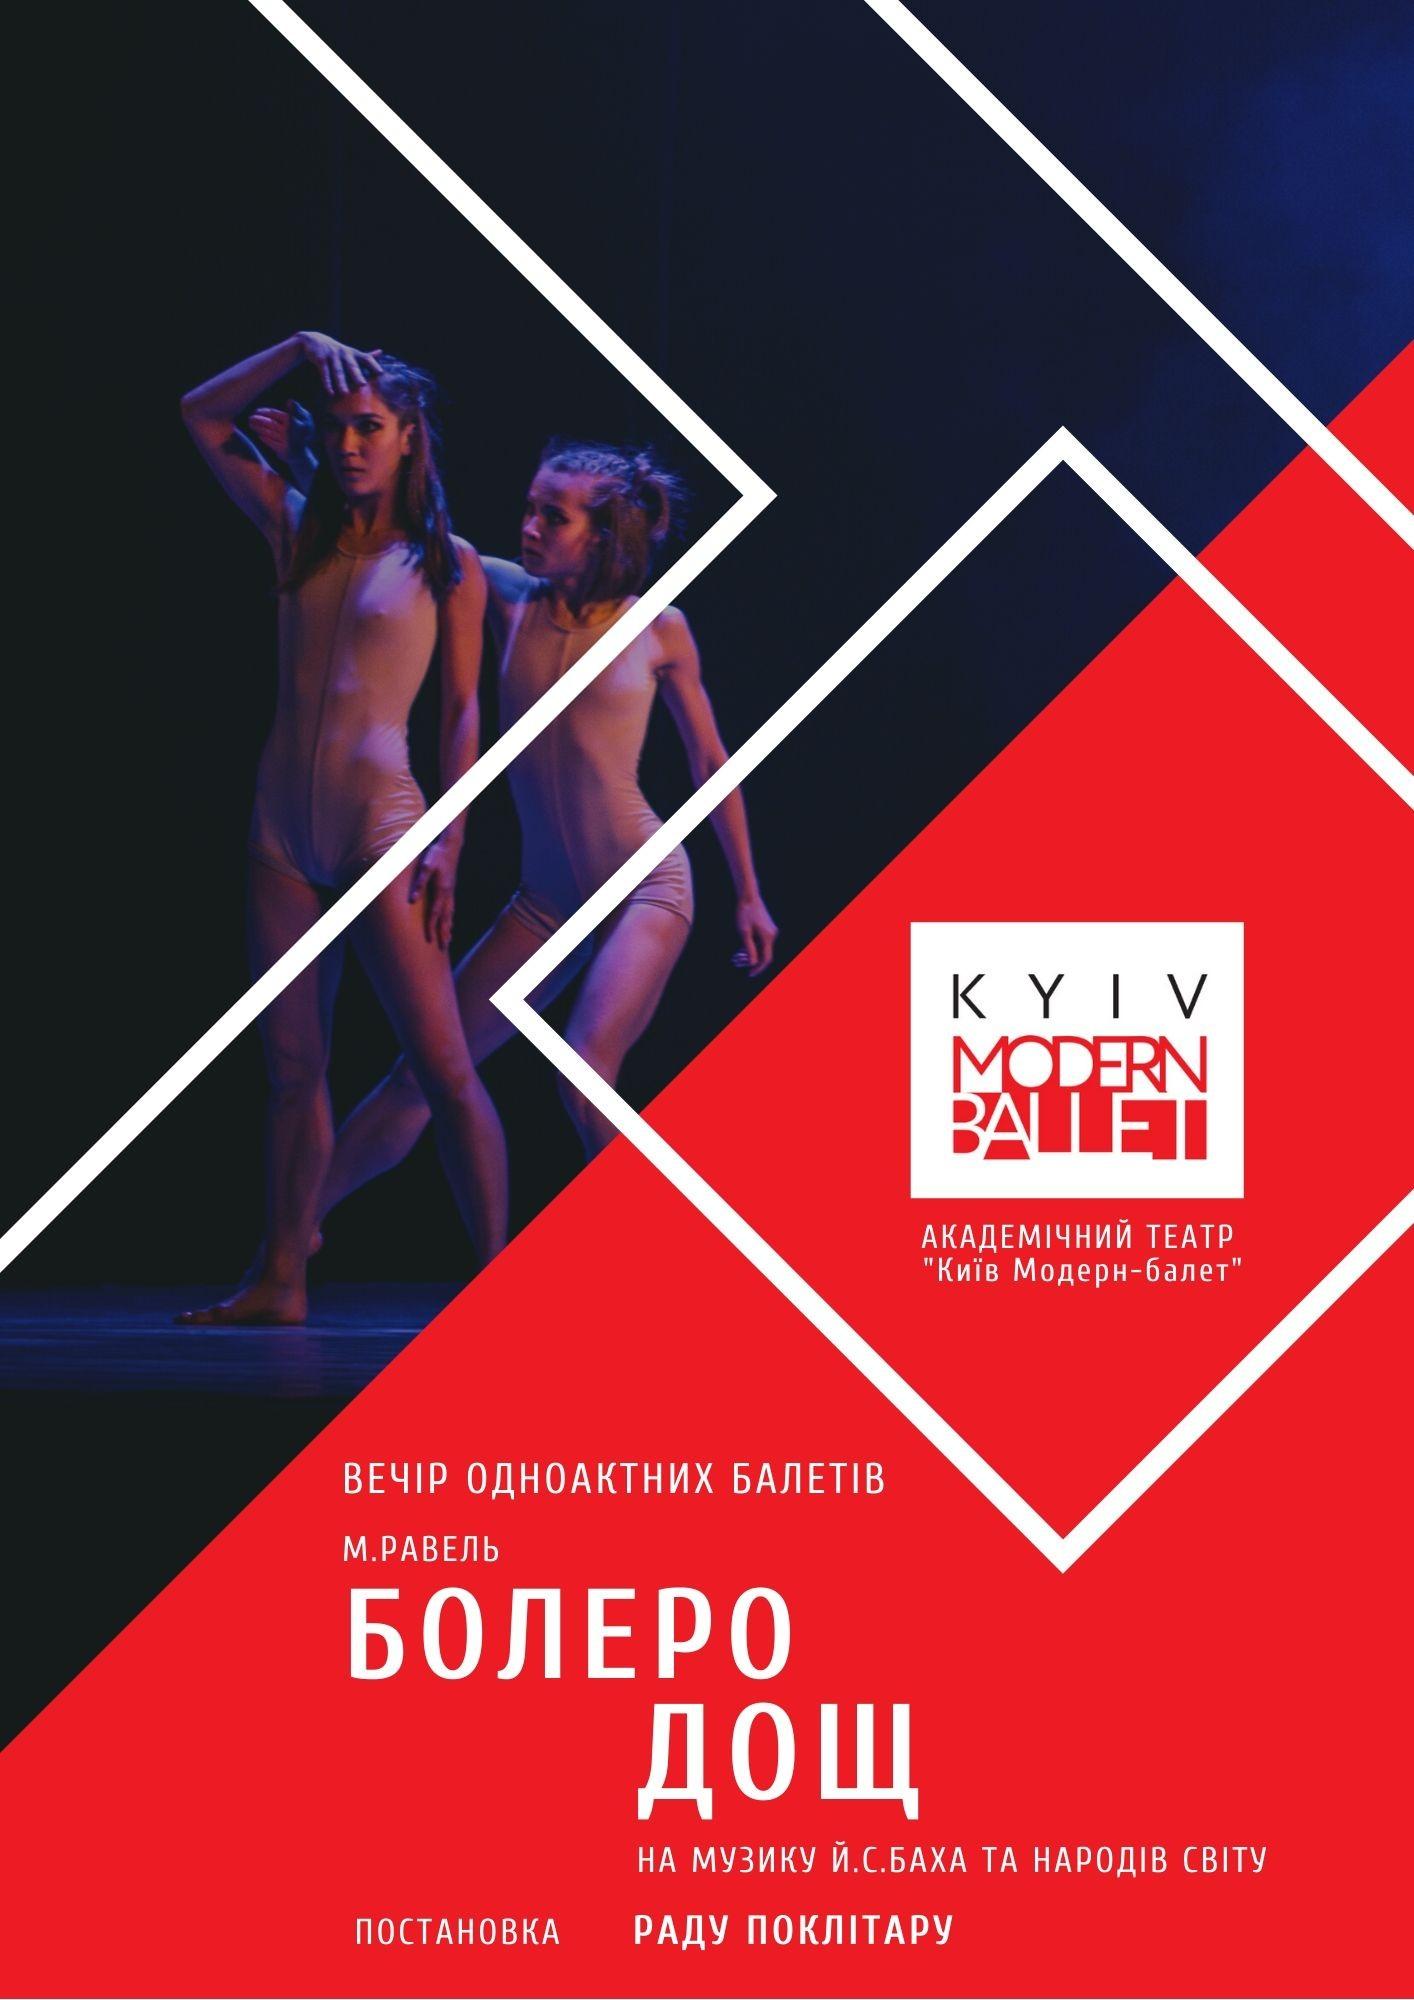 Билеты Kyiv Modern Ballet. Болеро. Дождь